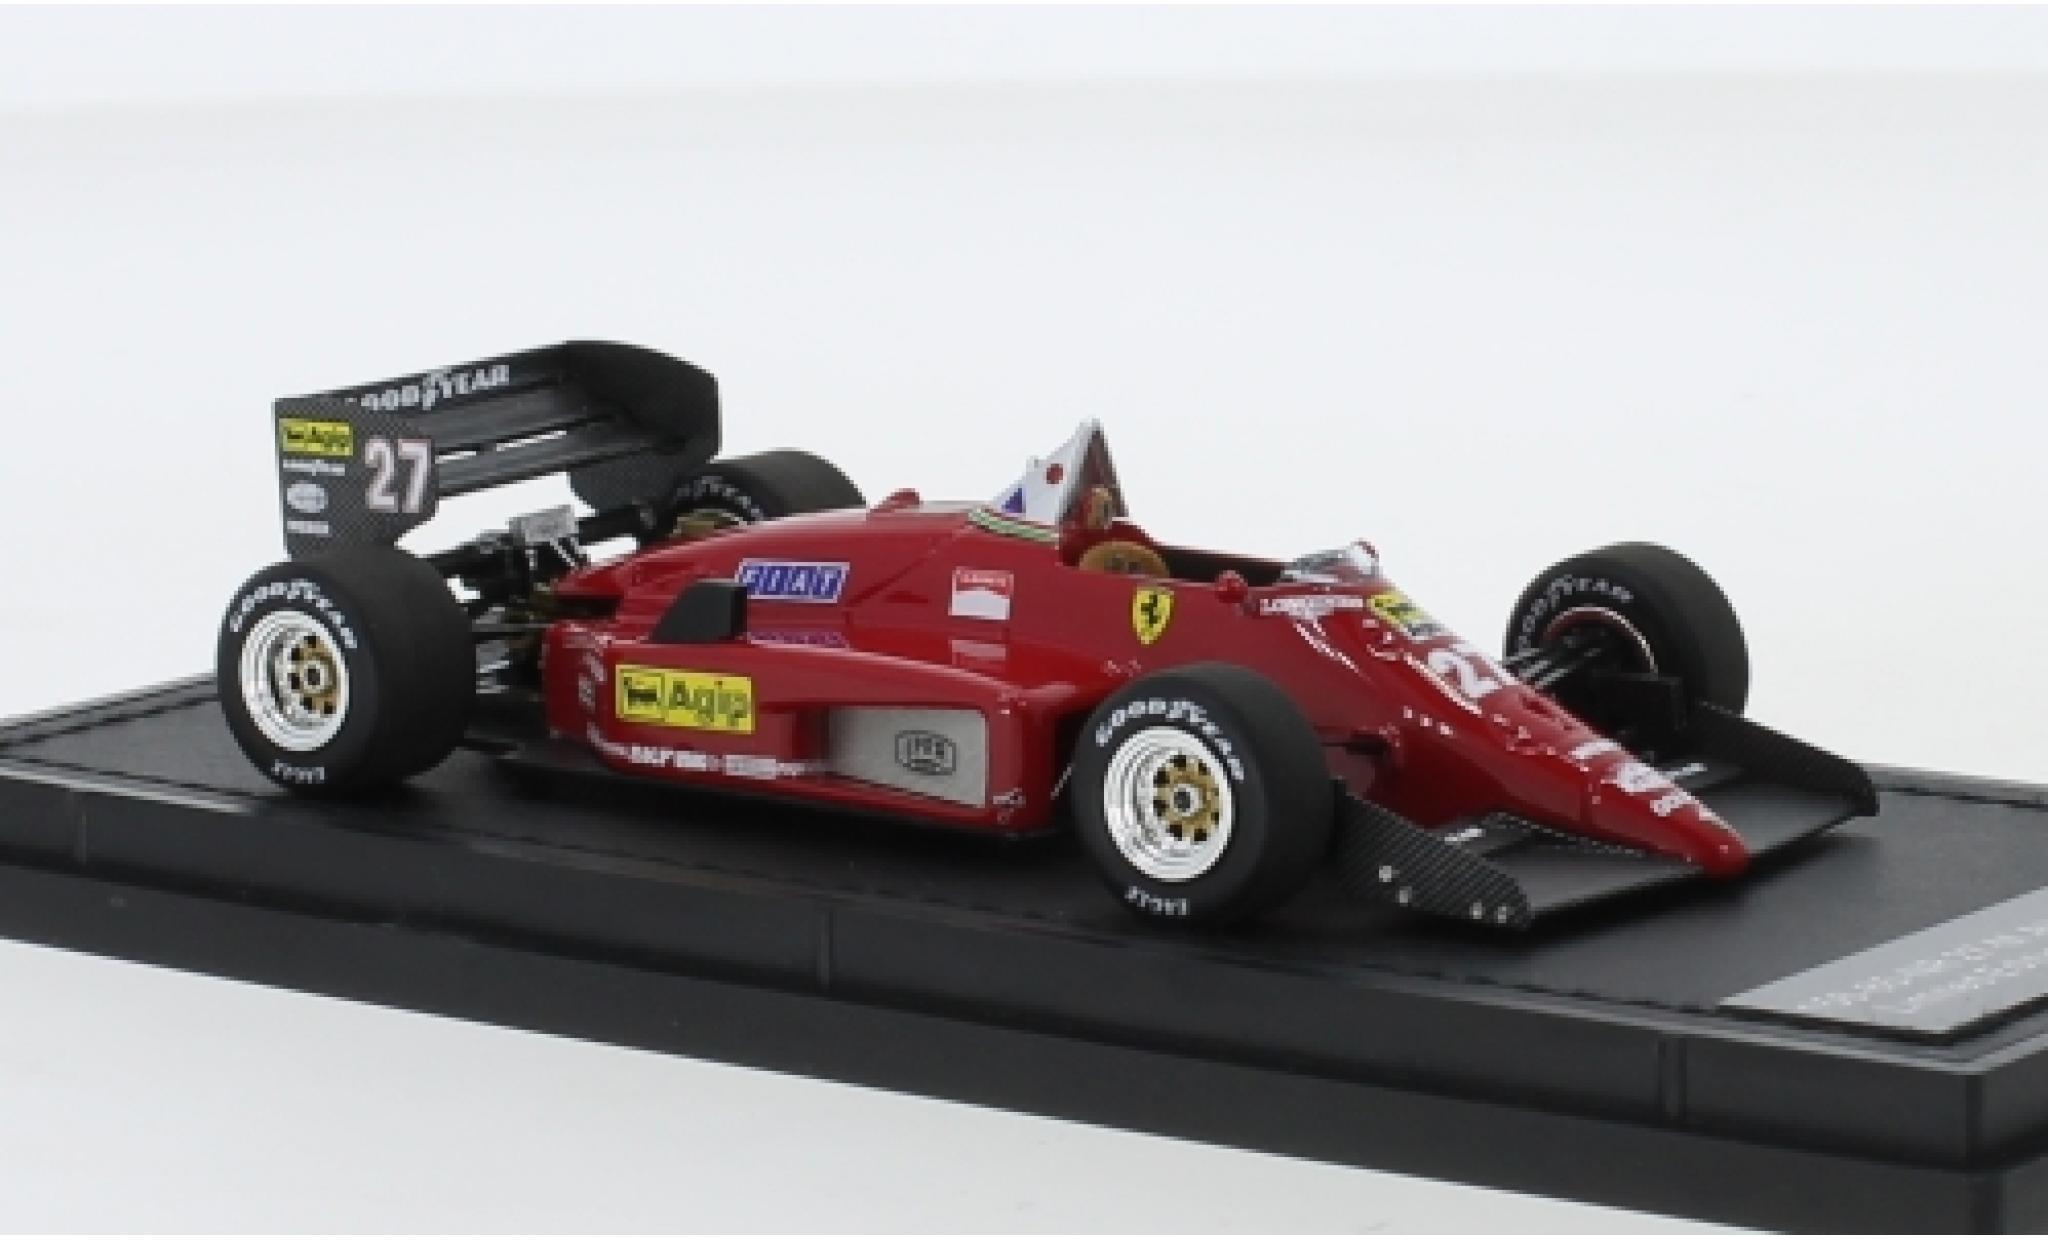 Ferrari 156 1/43 GP Replicas /85 No.27 Scuderia Formel 1 1987 M.Alboreto